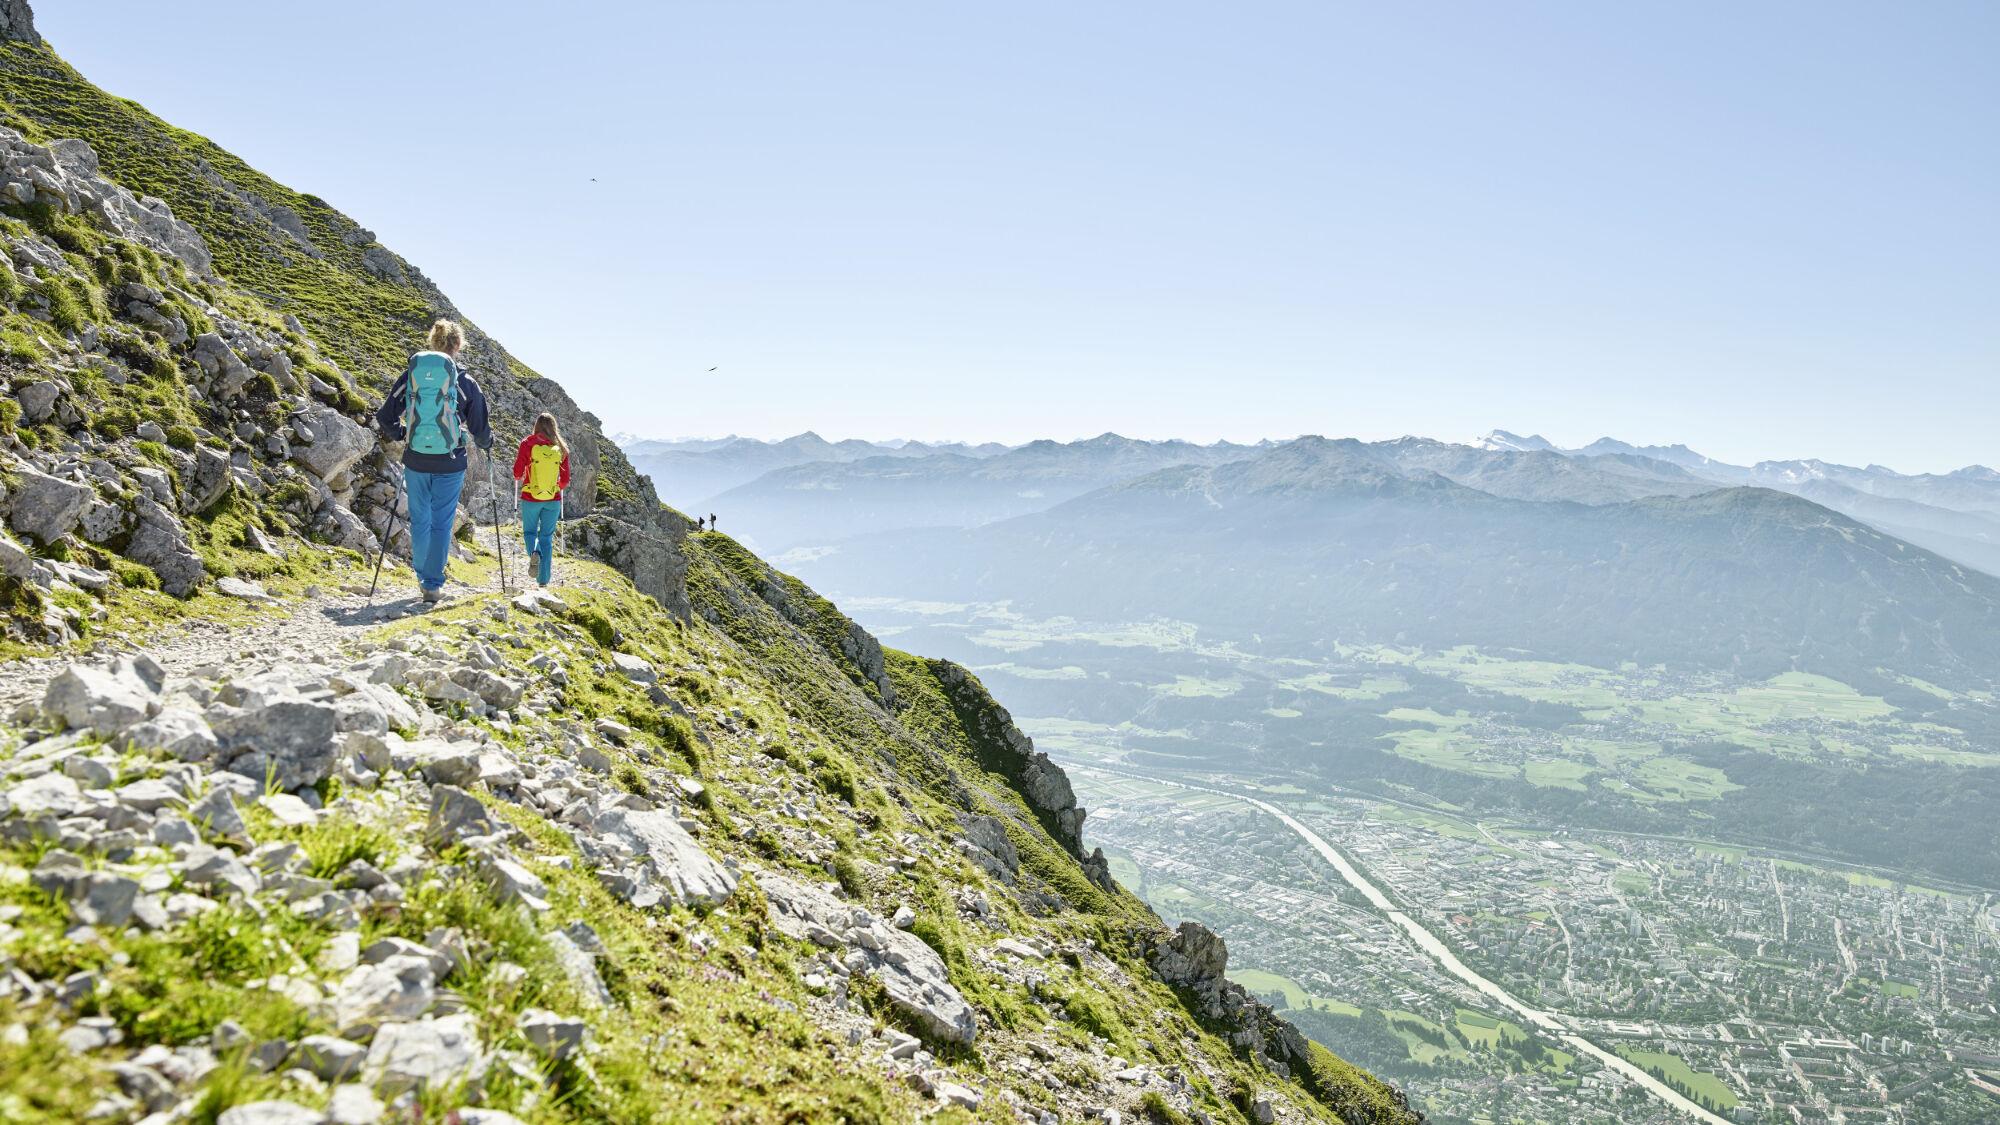 Zwei Wanderer in der Innsbrucker Berglandschaft